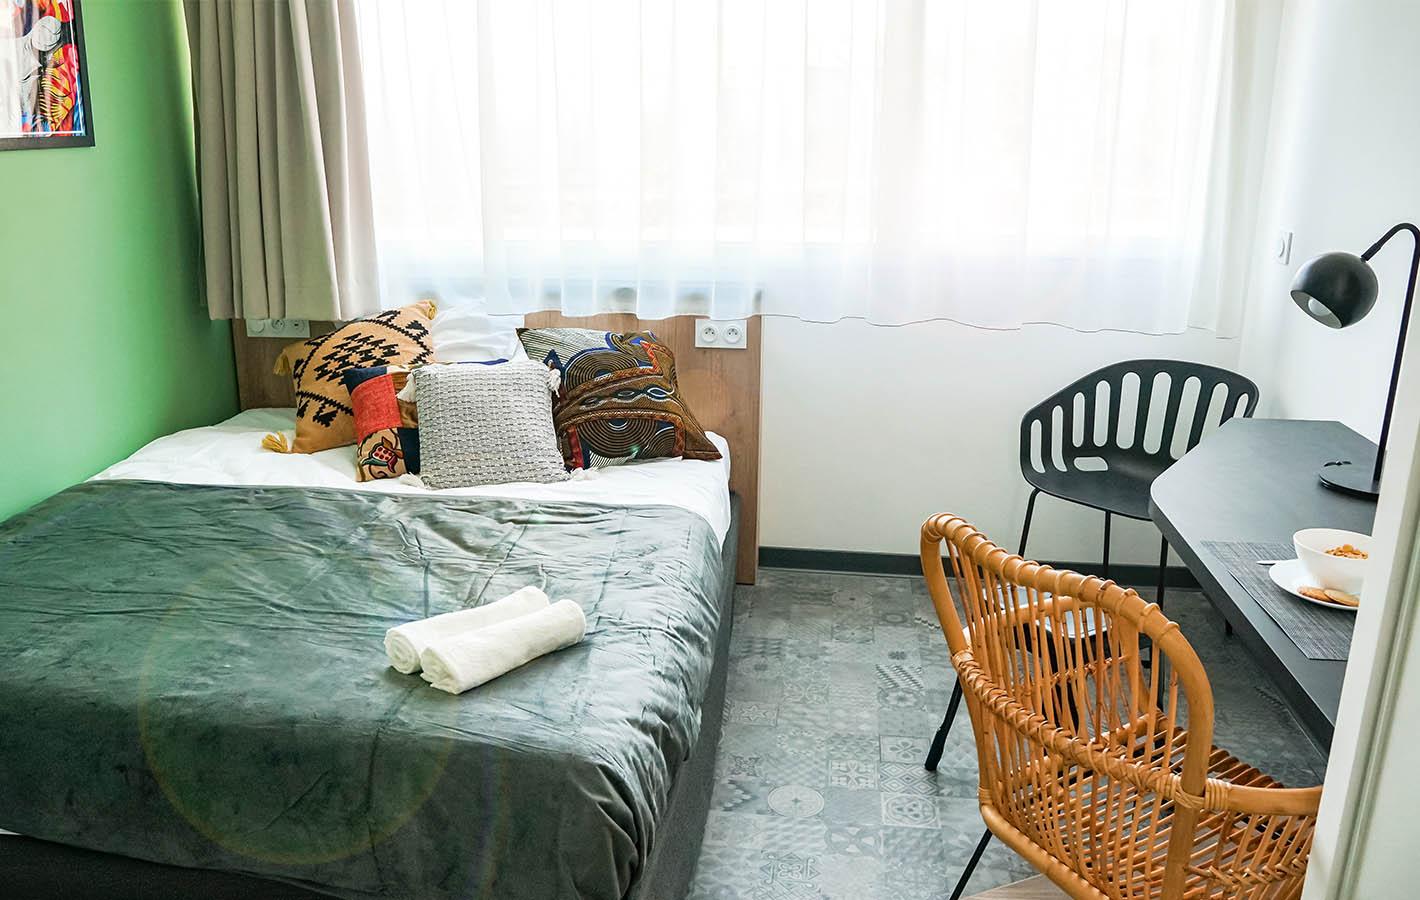 image  2021 01 28 residence etudiante suitetudes kabane montpellier chambre 2 compr